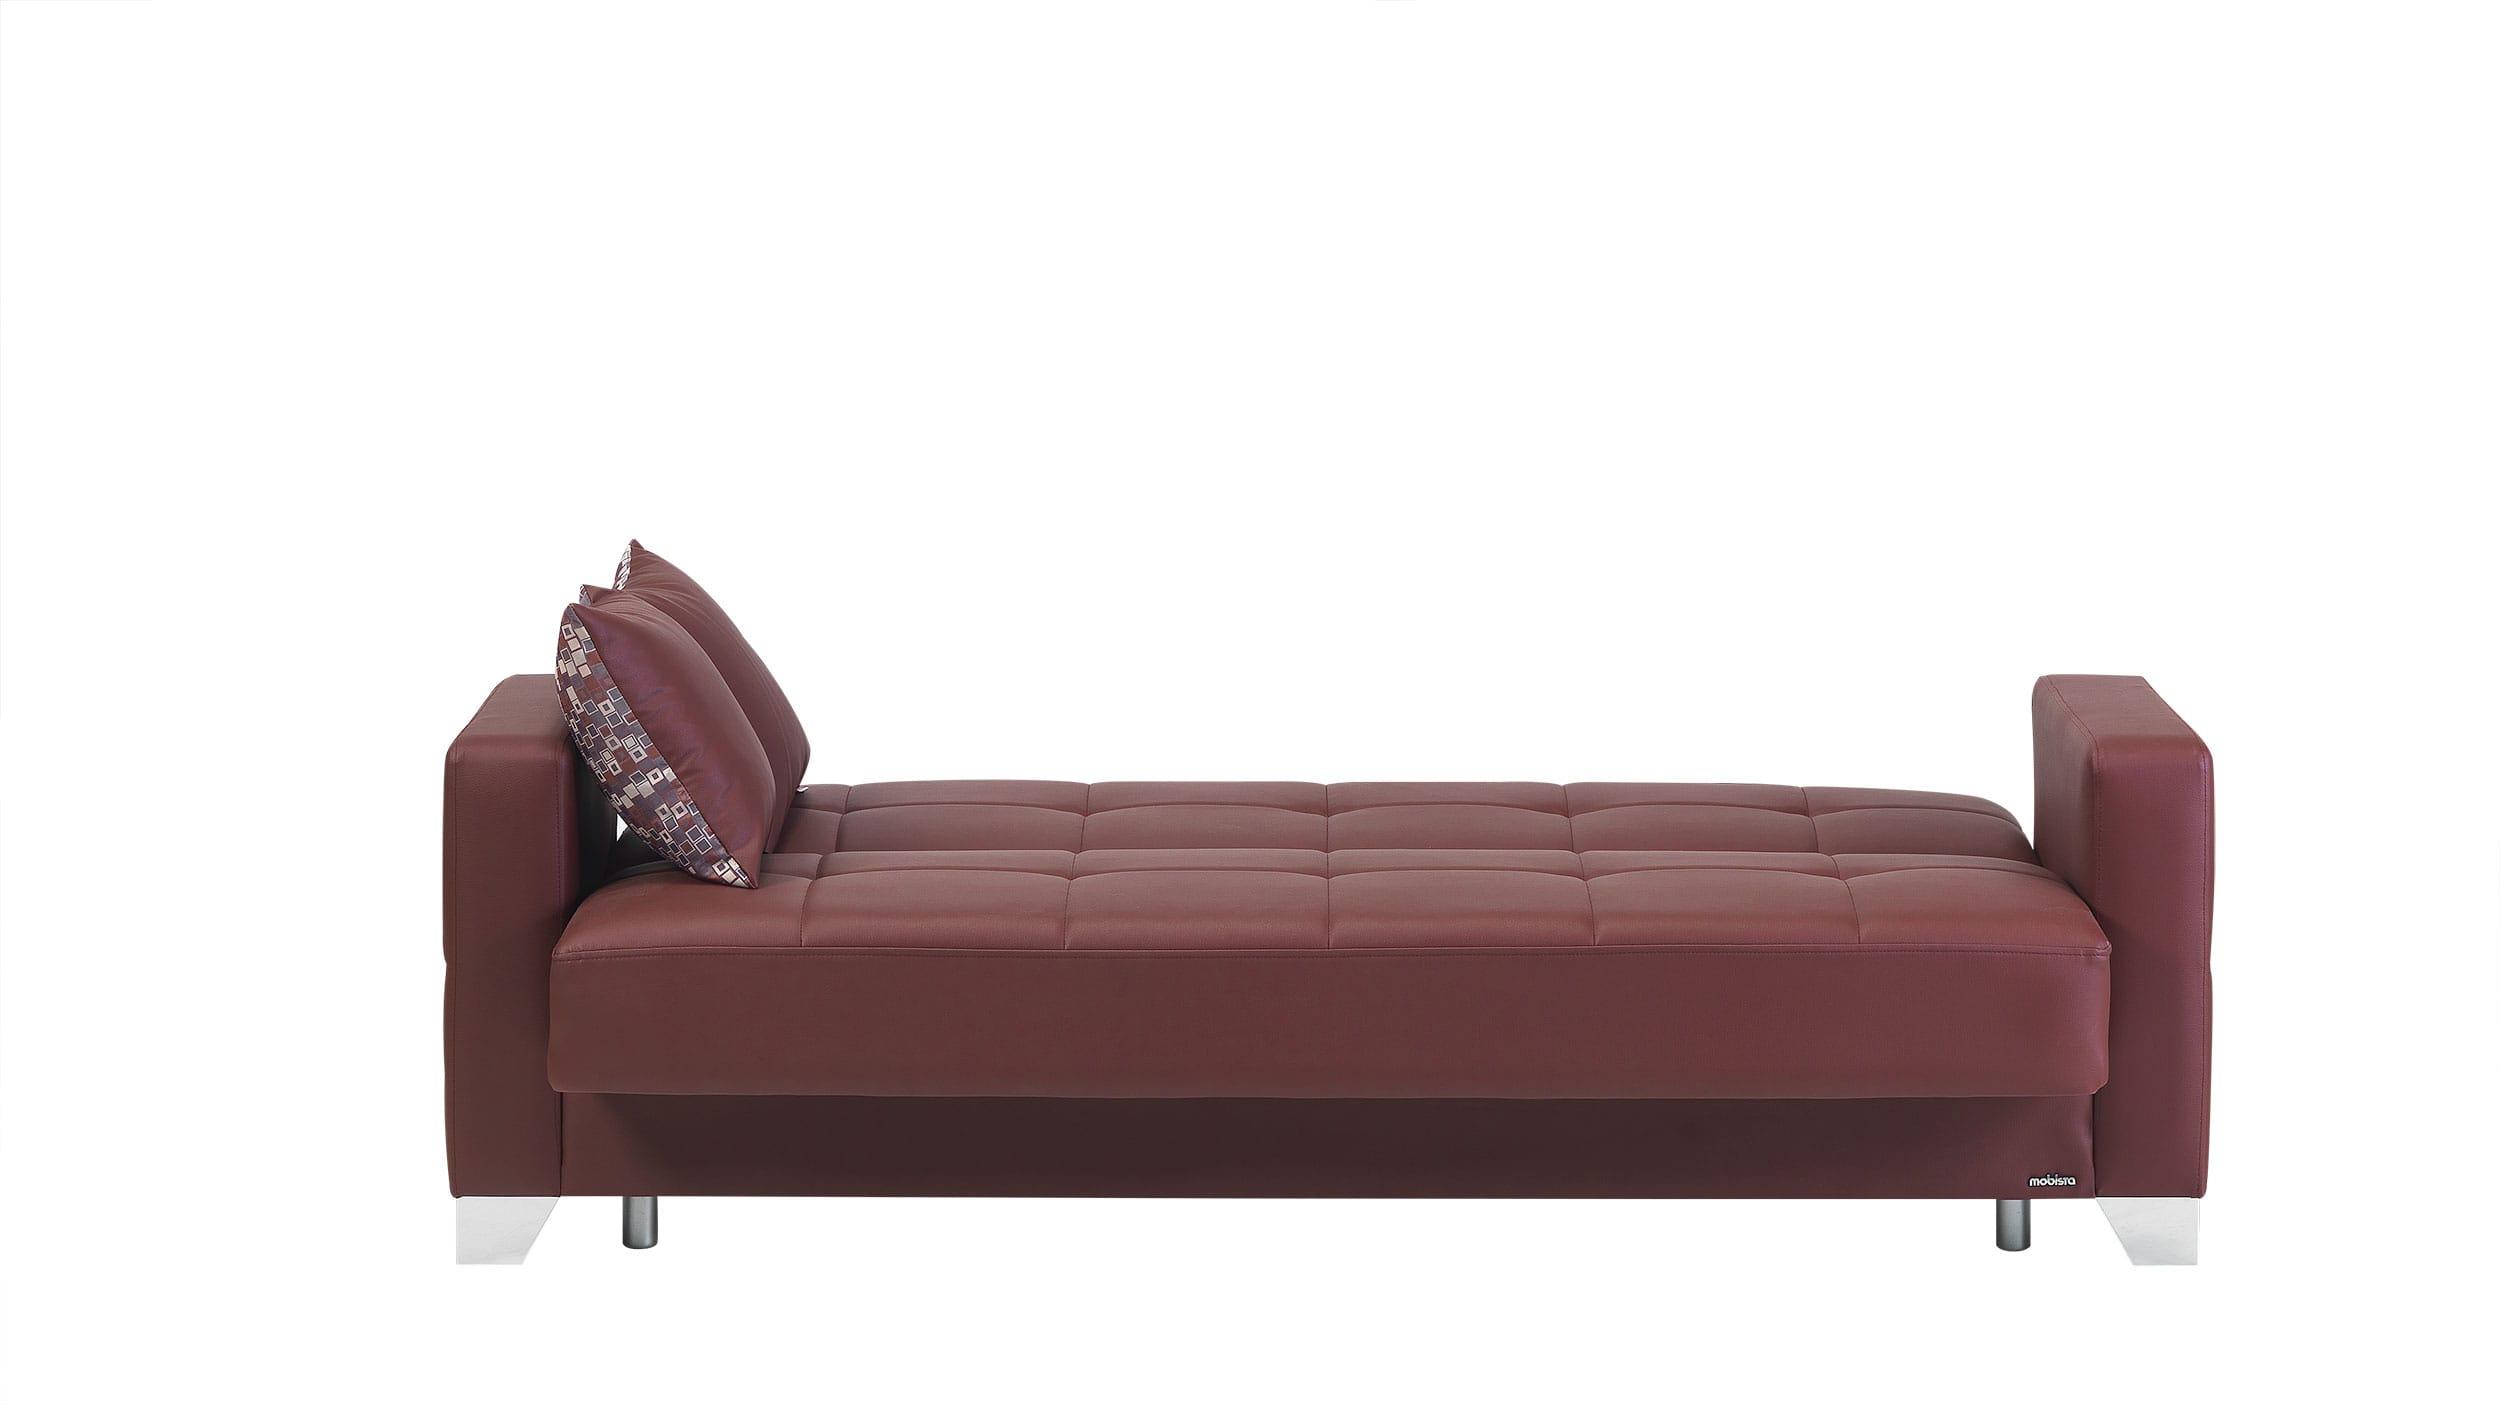 leatherette sofa durability corner rug size viva italia prestige burgundy bed by mobista